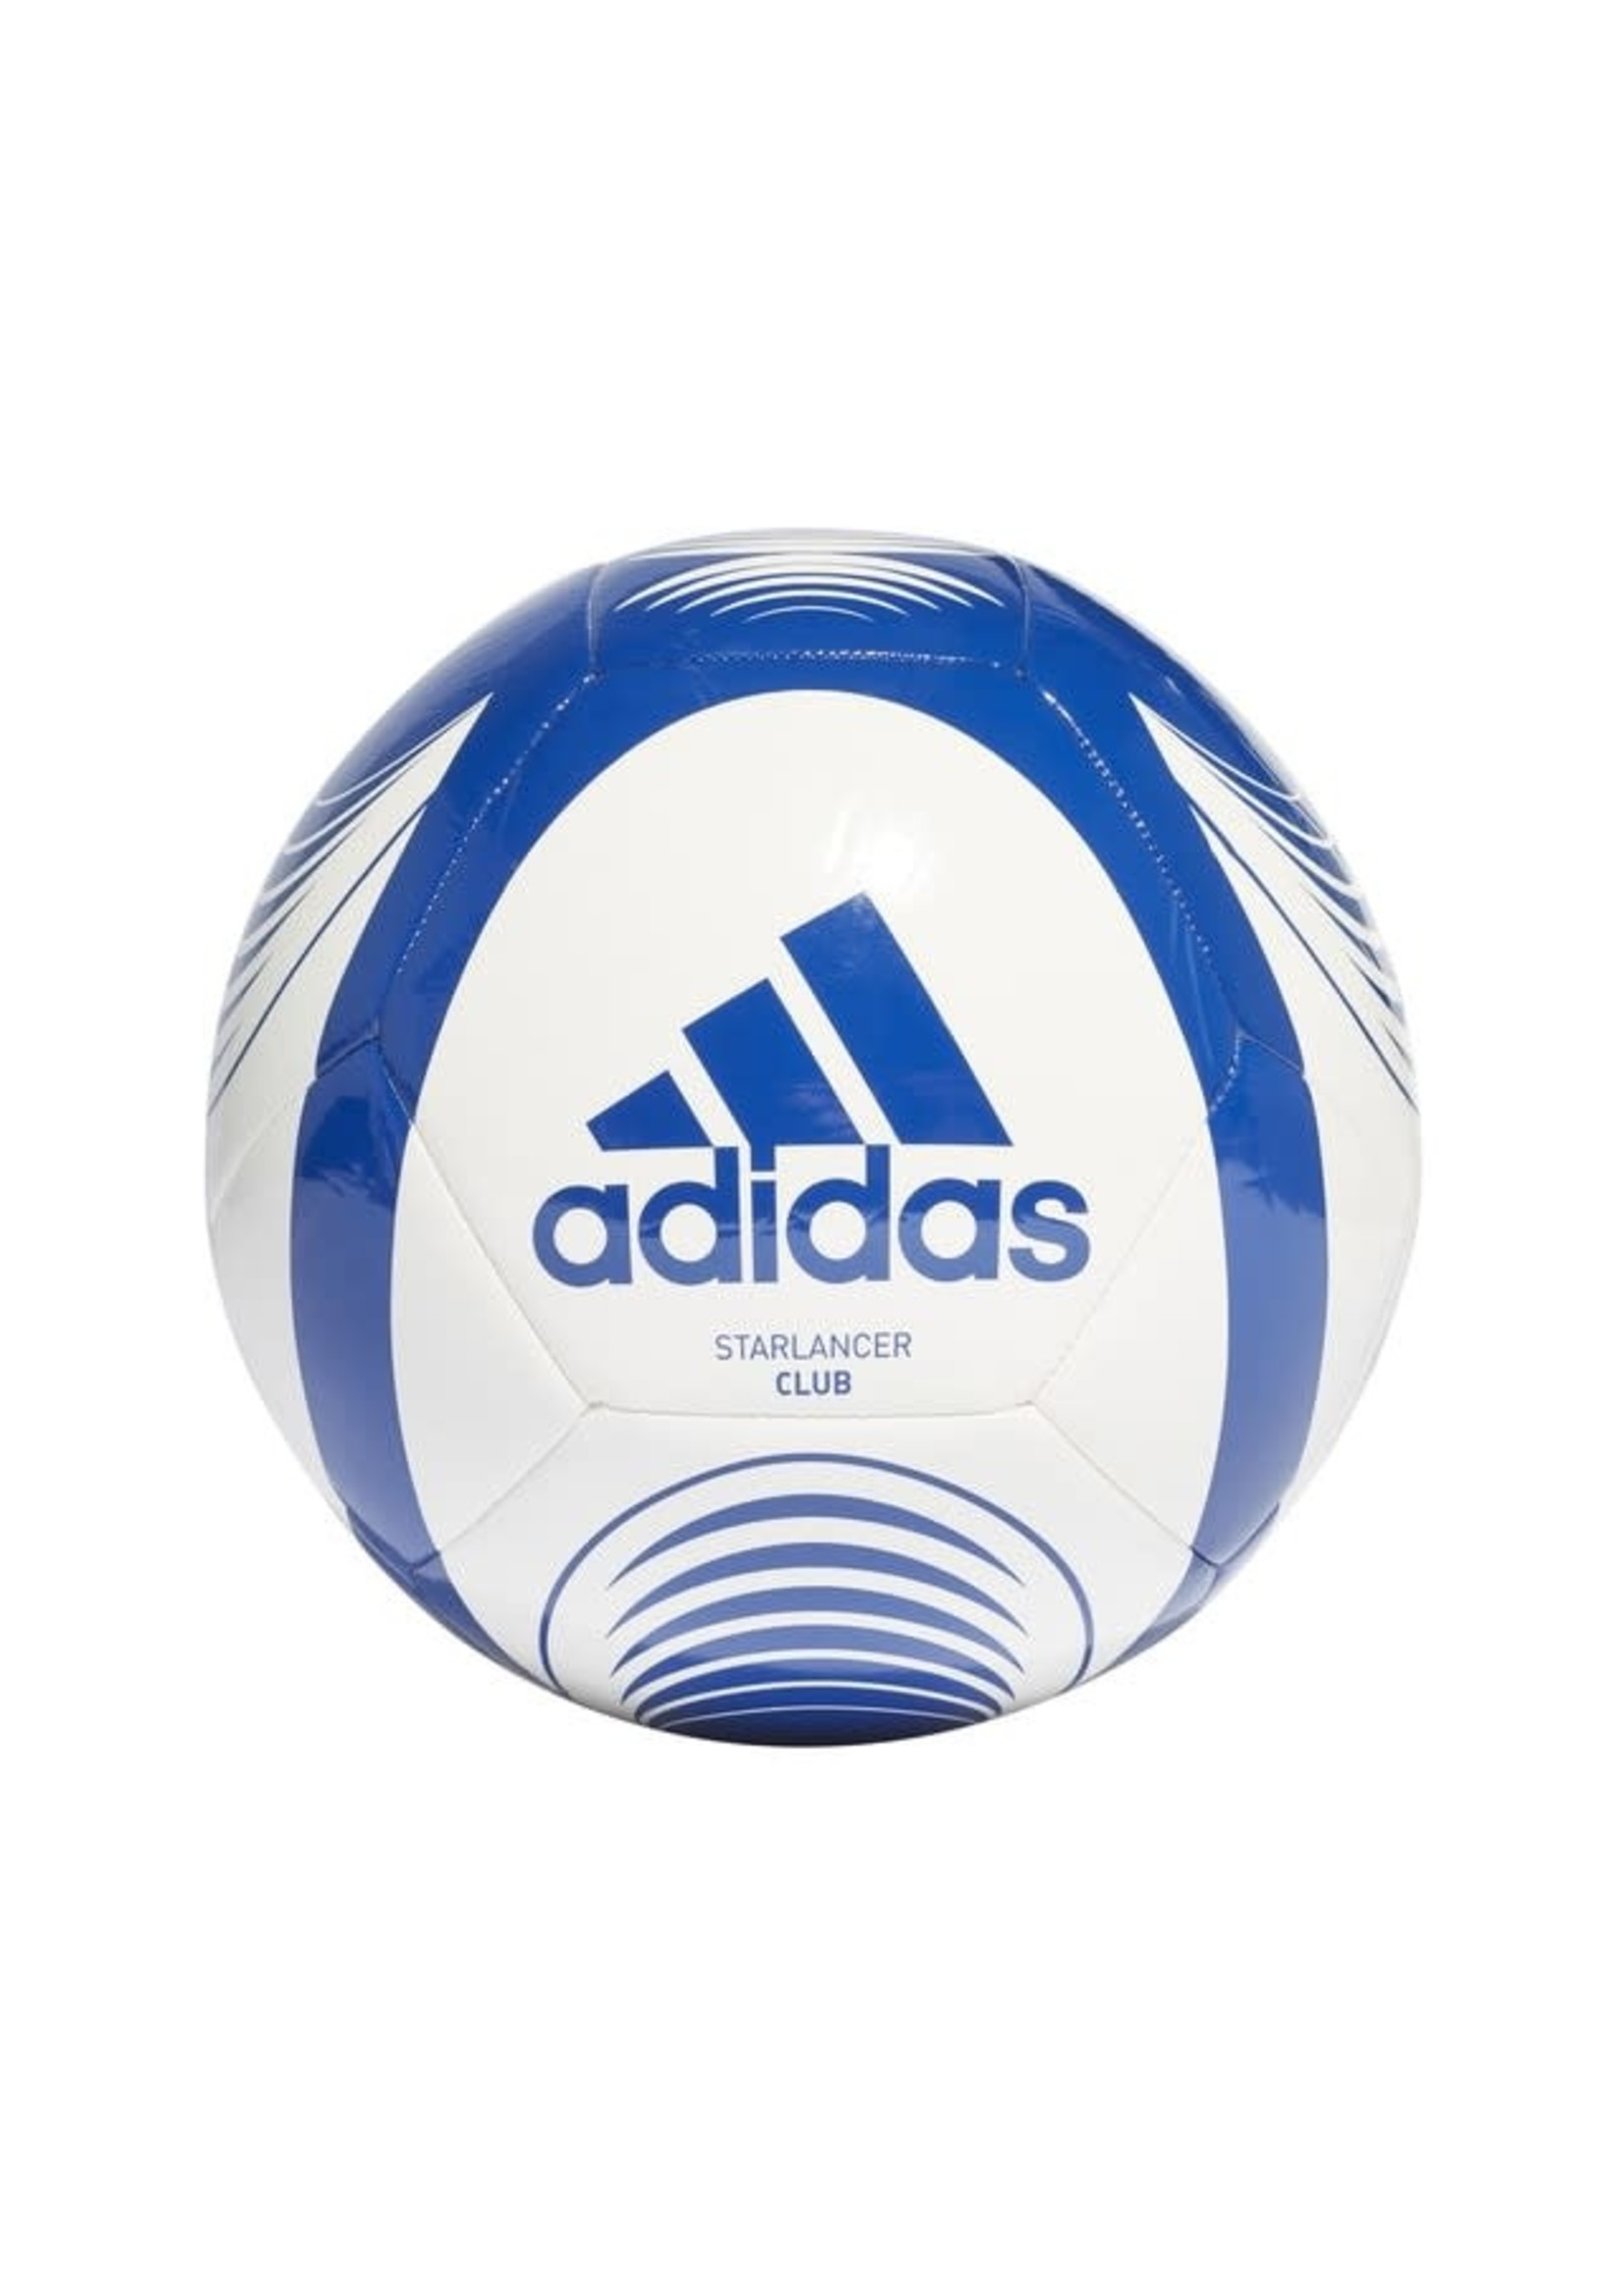 Adidas Adidas Starlancer Club Football (2022) White/Blue